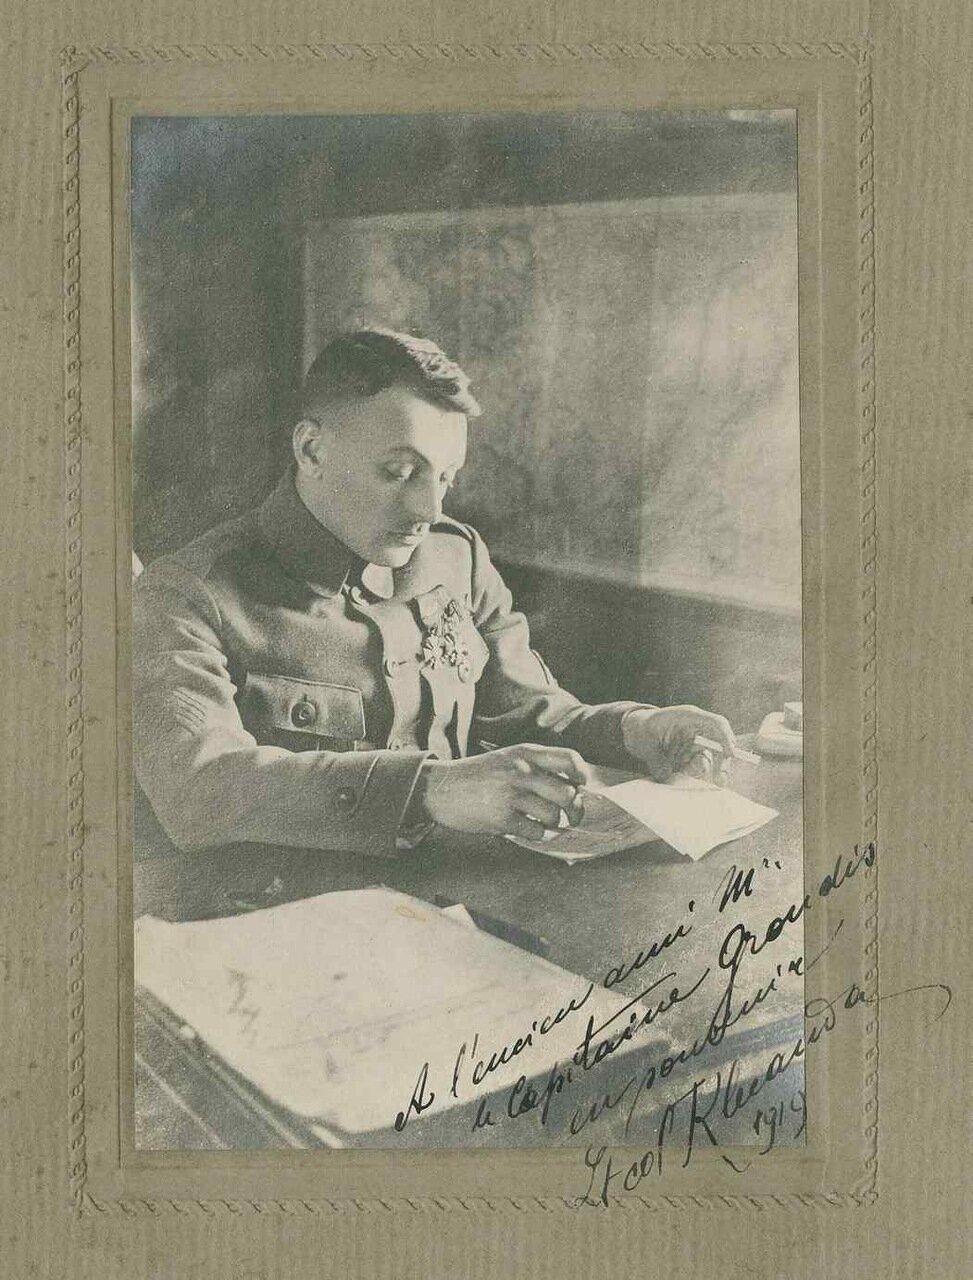 1919. Войтех Владимир Клецанда, капитан Чехословацкого корпуса